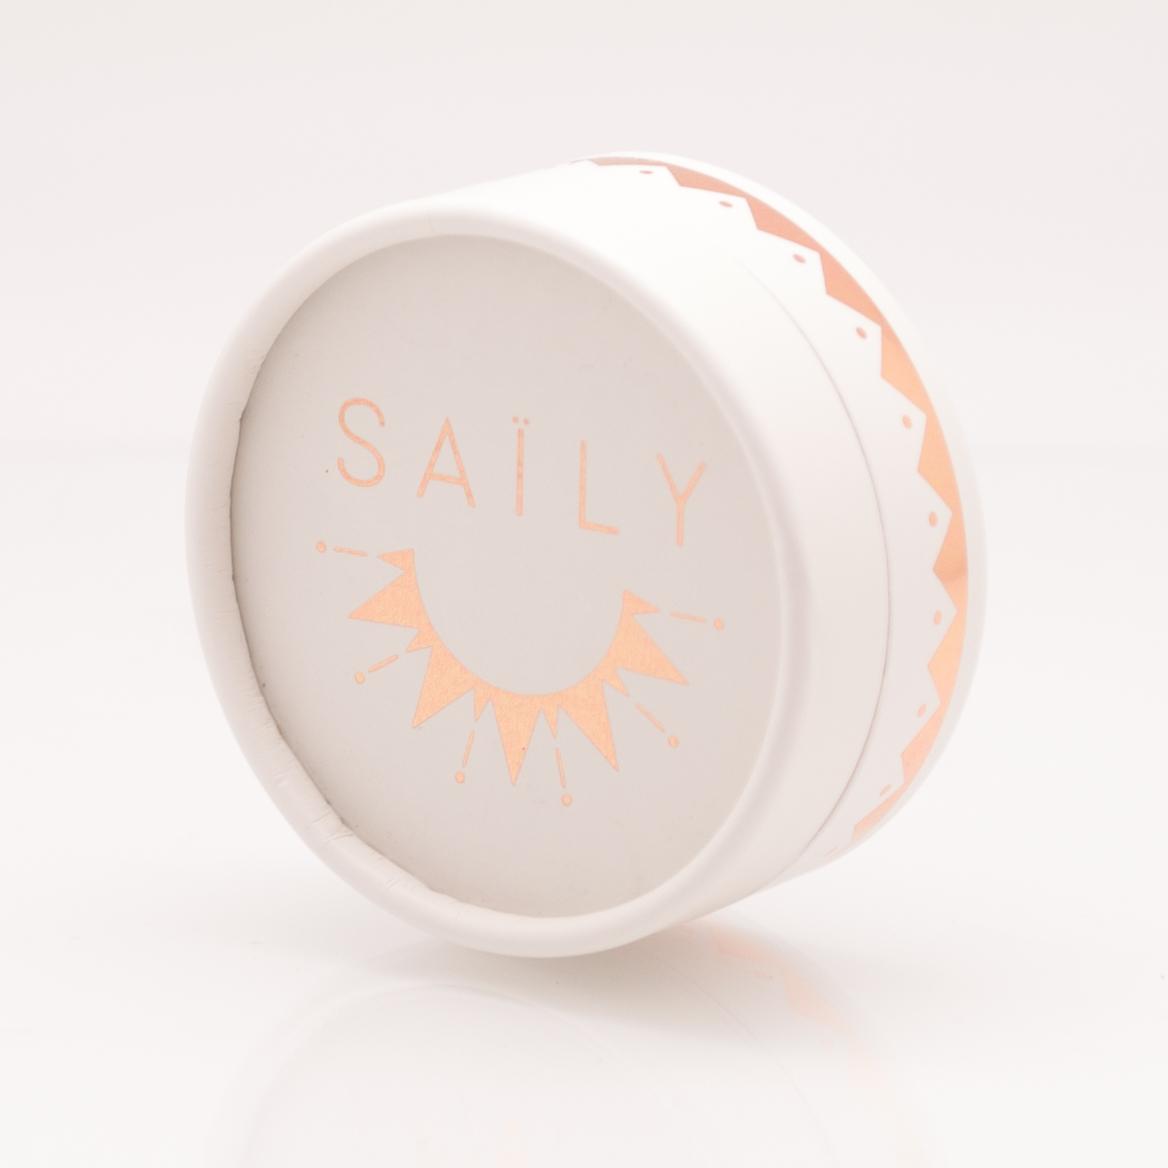 SAILY BOLA パイエットマタニティネックレス -シルバー/シルバーラメ